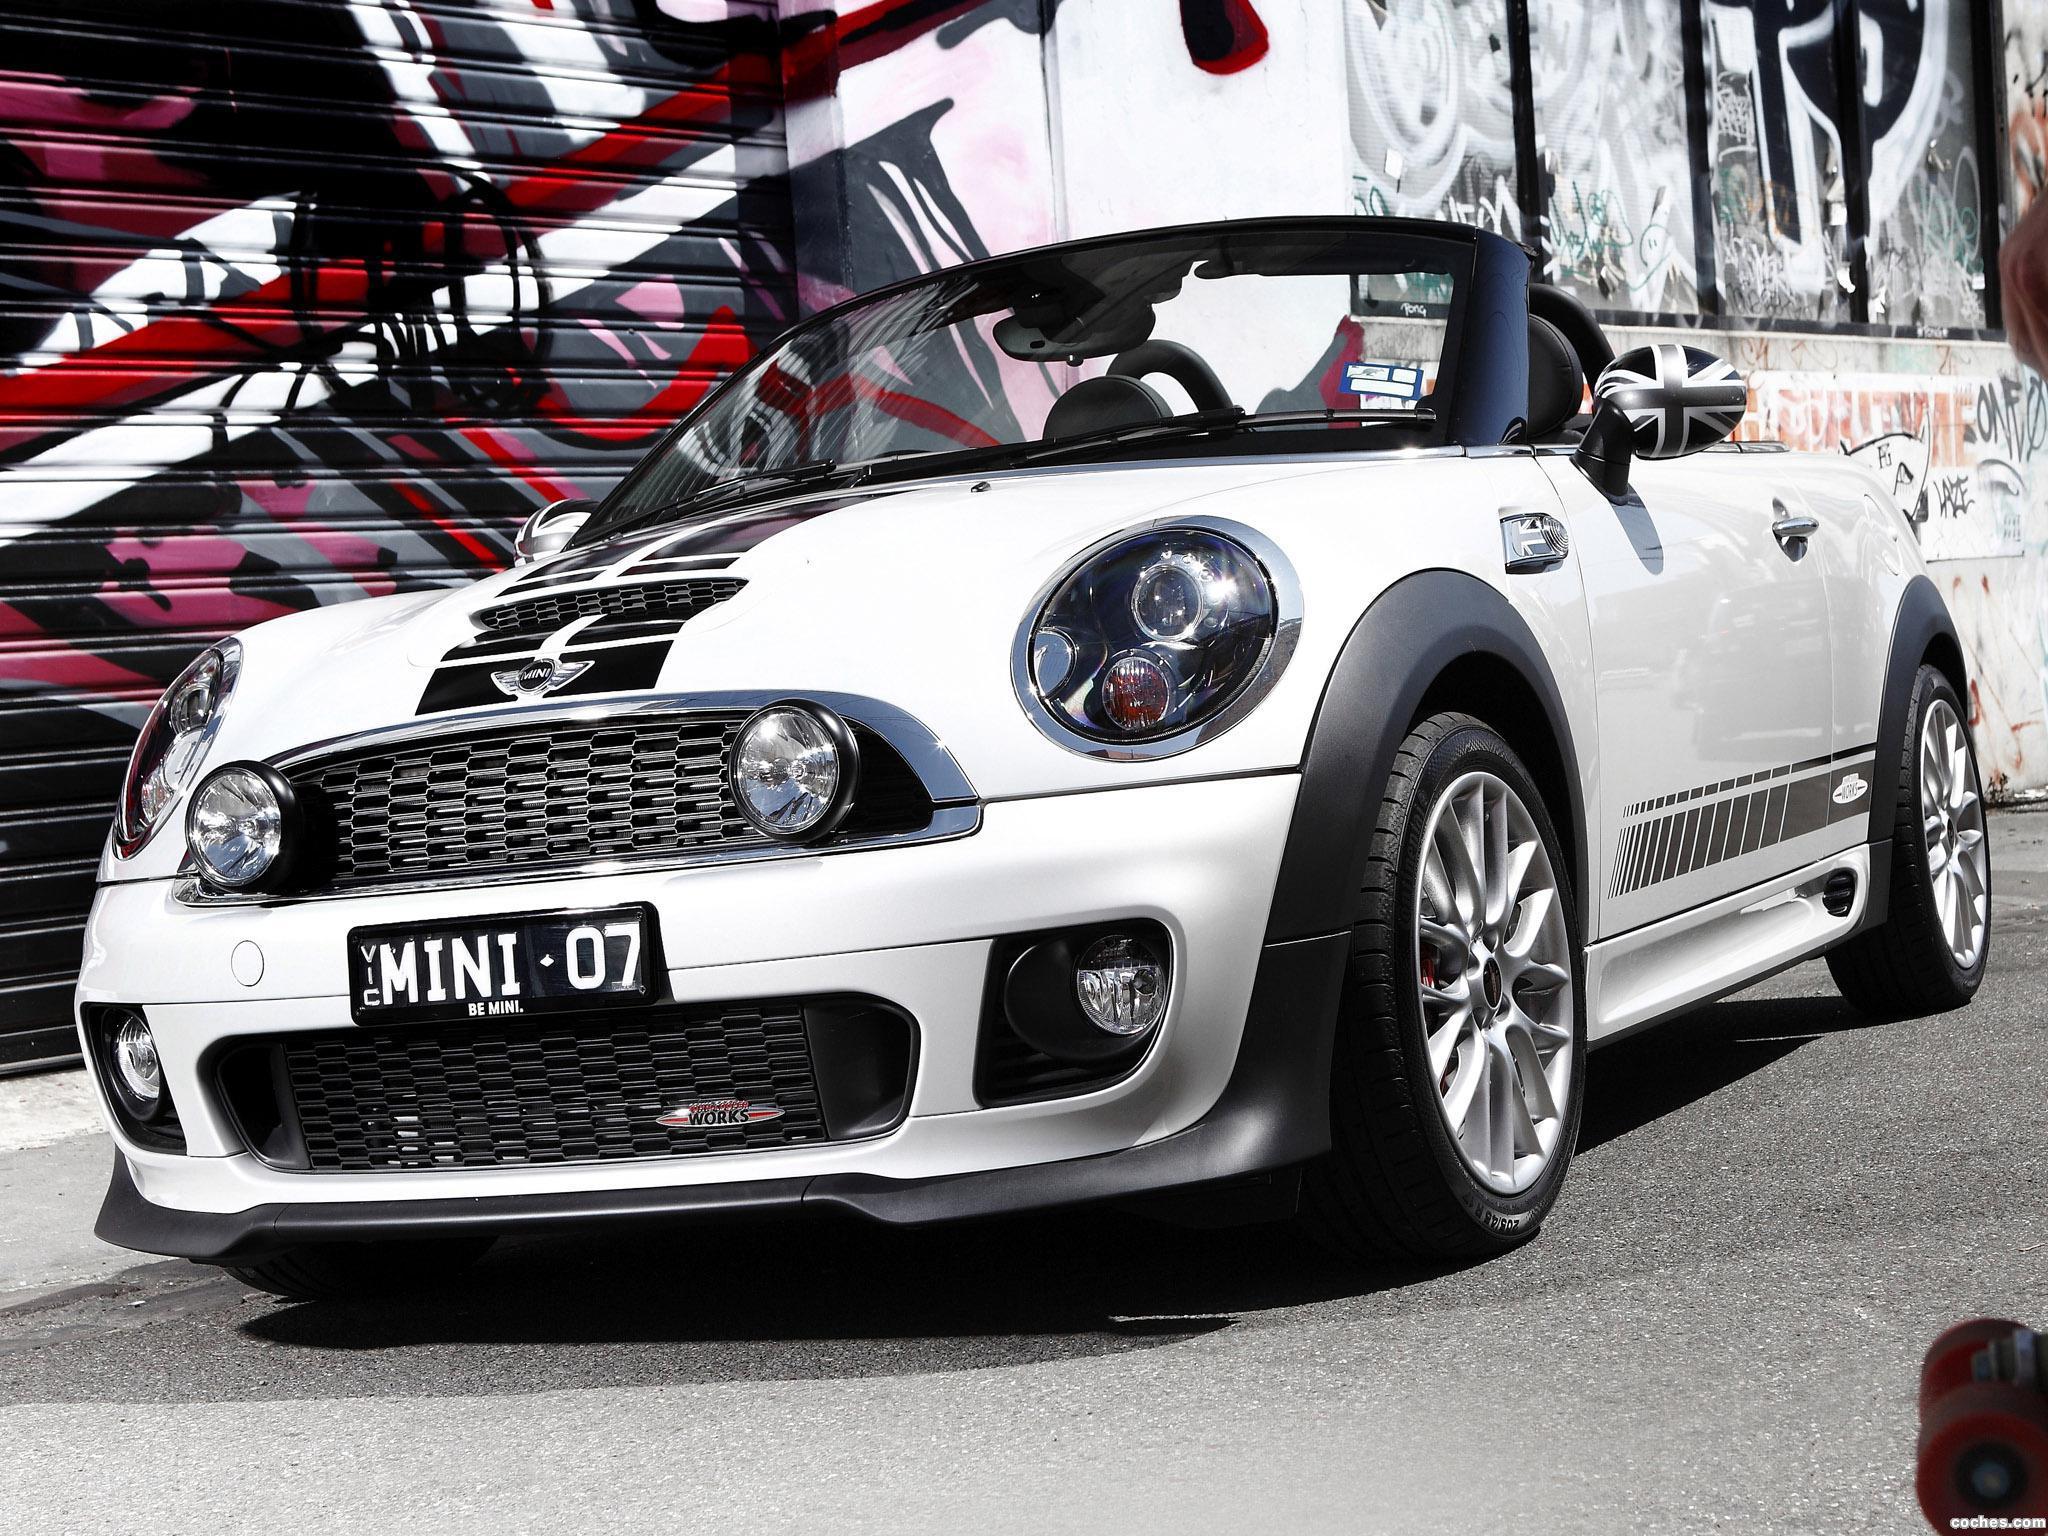 mini_john-cooper-works-roadster-r59-australia-2012_r12